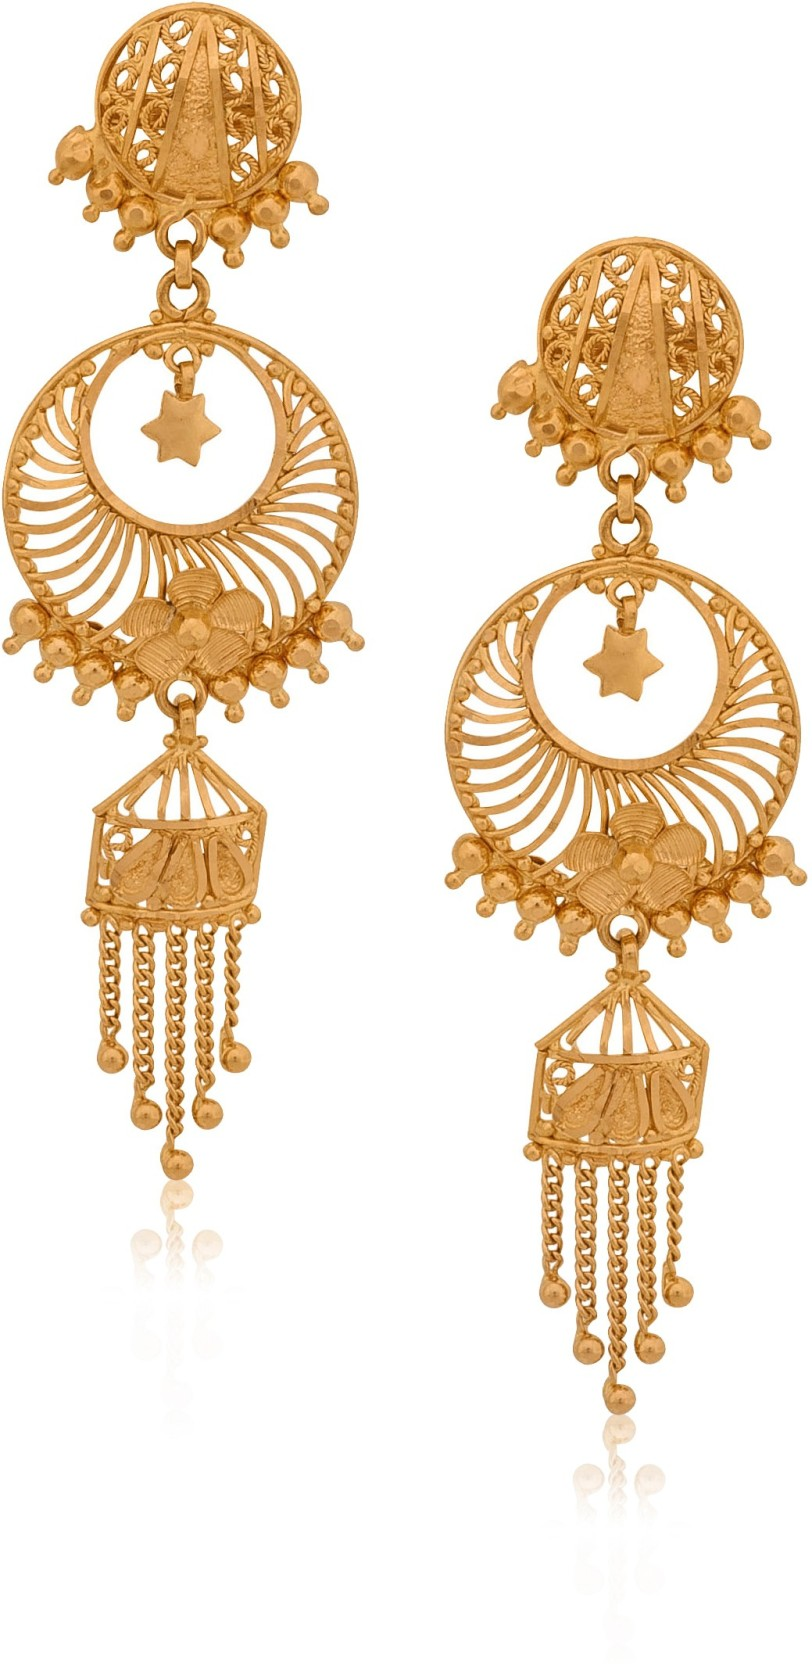 Beautiful Kaner Kanbala Photo Ideas - Jewelry Collection Ideas ...